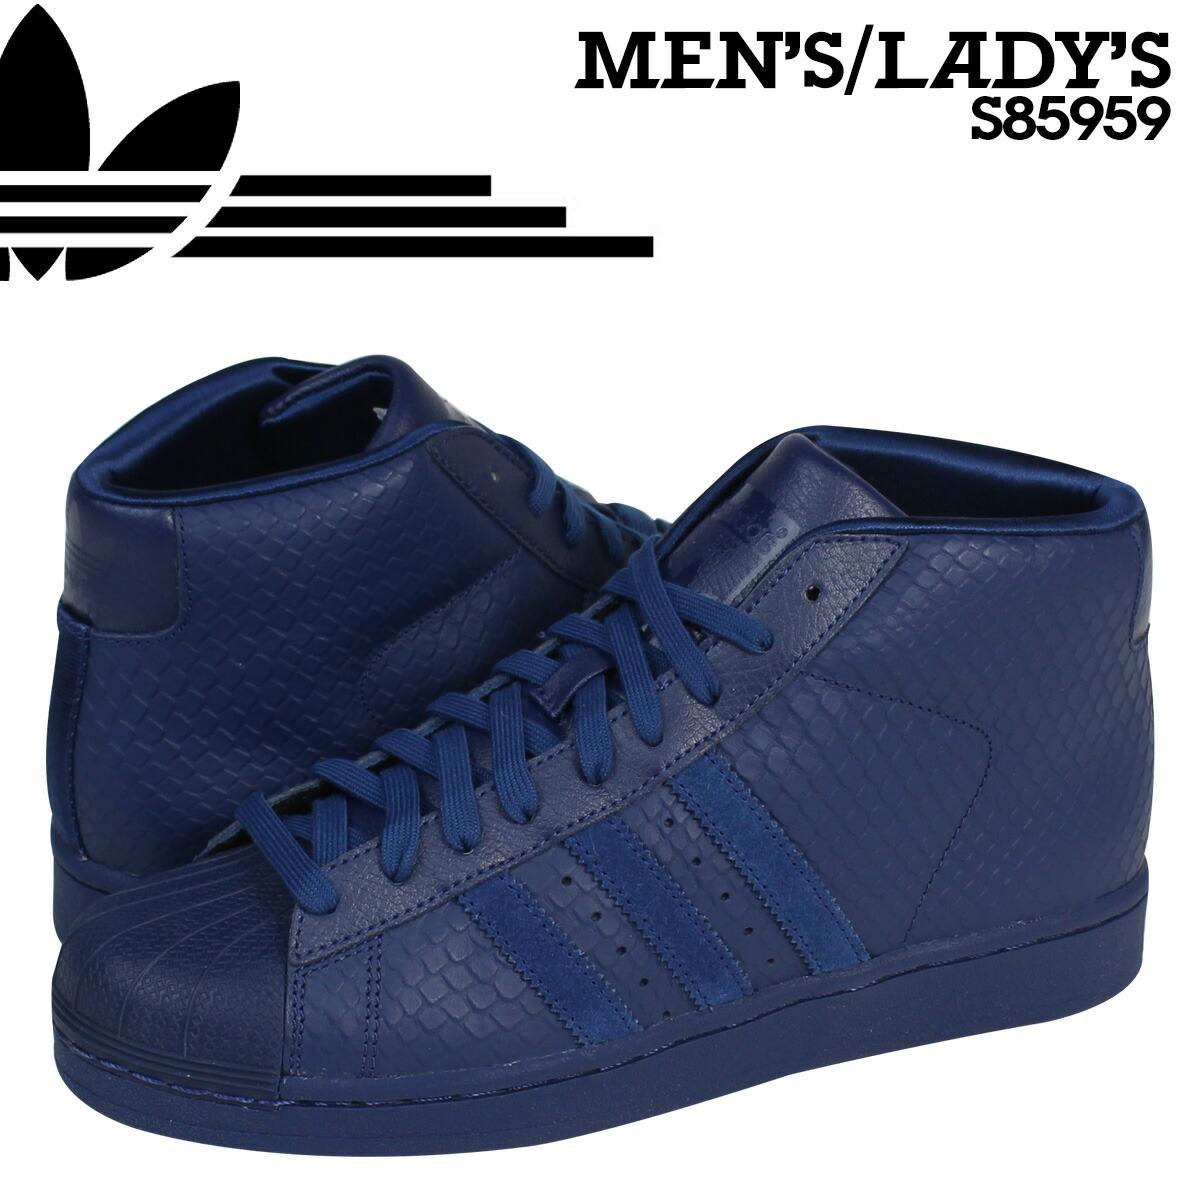 Adidas Sneakers Snake